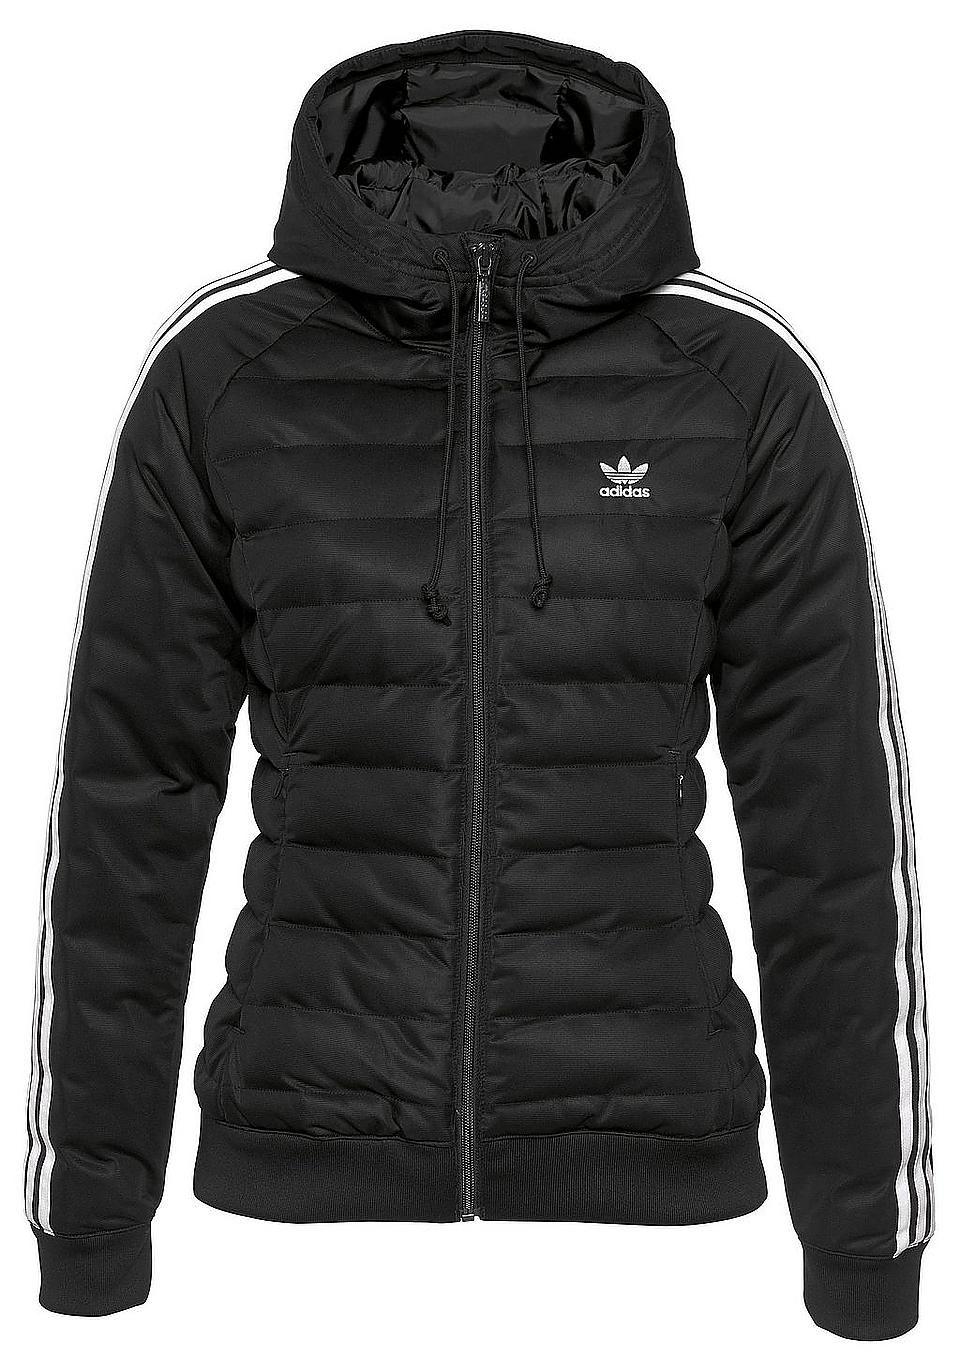 Adidas Originals Steppjacke Slim Jacket Steppjacke Winterjacke Daunenmantel Daunenjacke Steppmantel B Winterjacke Damen Jacken Adidas Winterjacke Damen